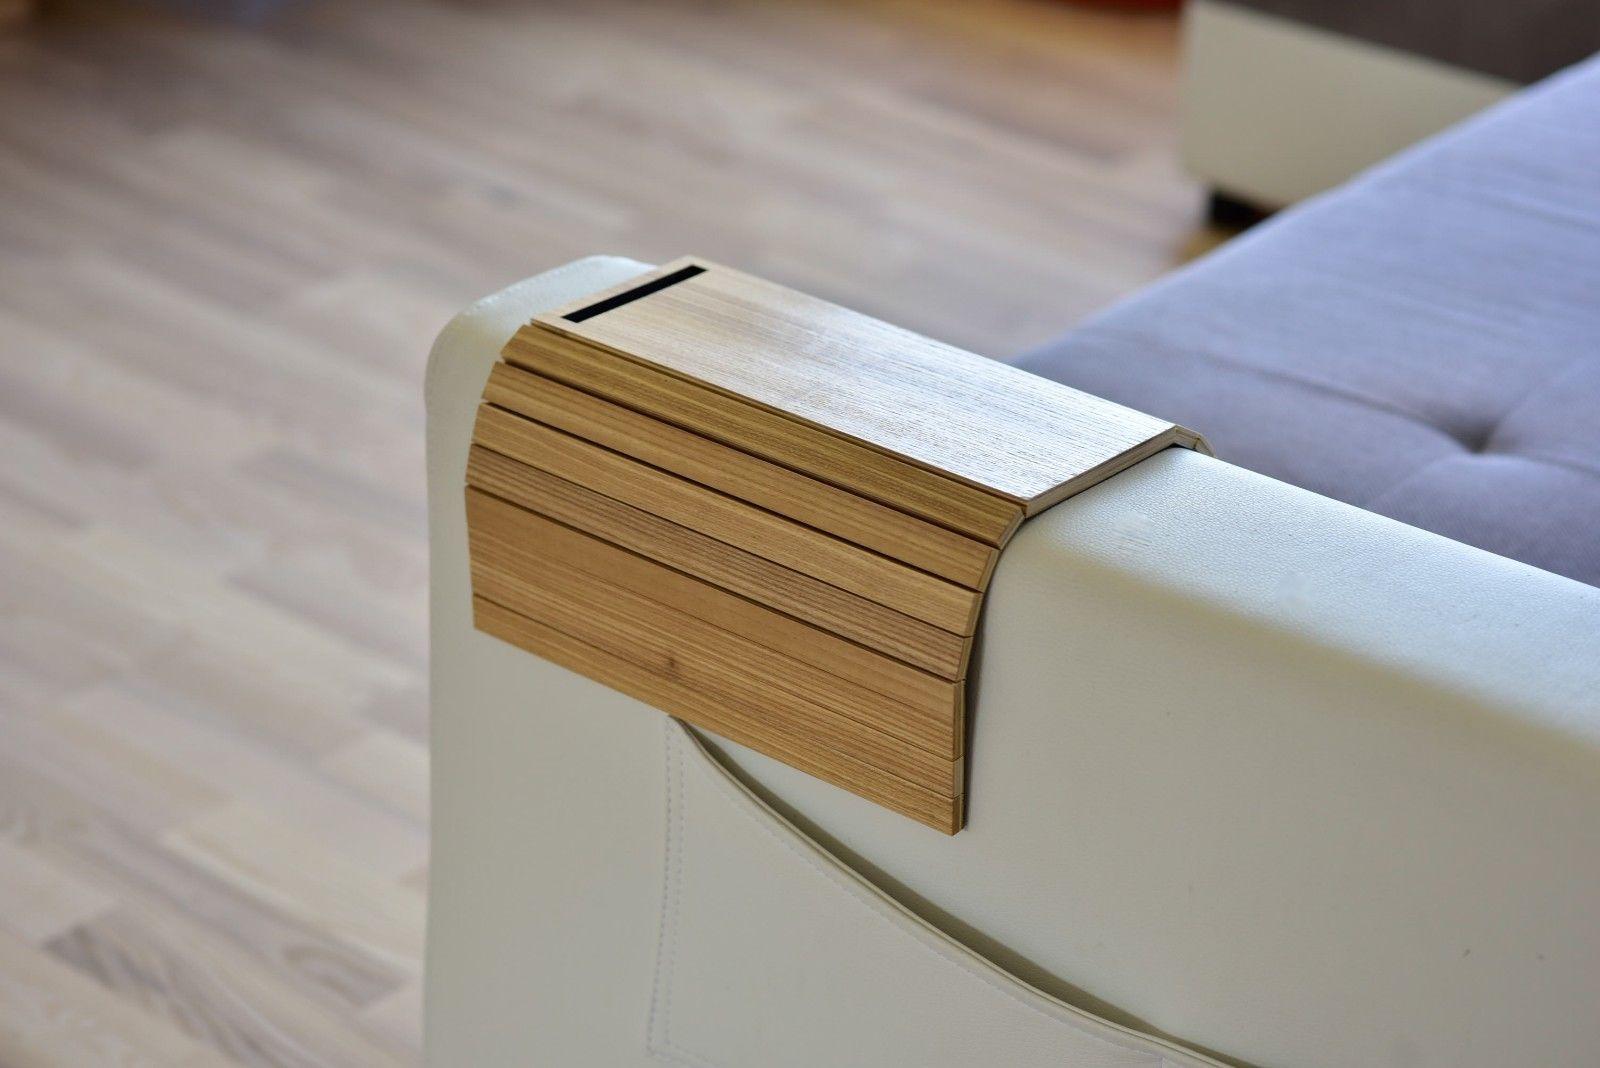 Wood Sofa Arm Tray Protectors Armrest Table Sofa Table Coaster Sofa Tray Ebay Sofa Tables For Sale Living Room Sofa Wood Sofa